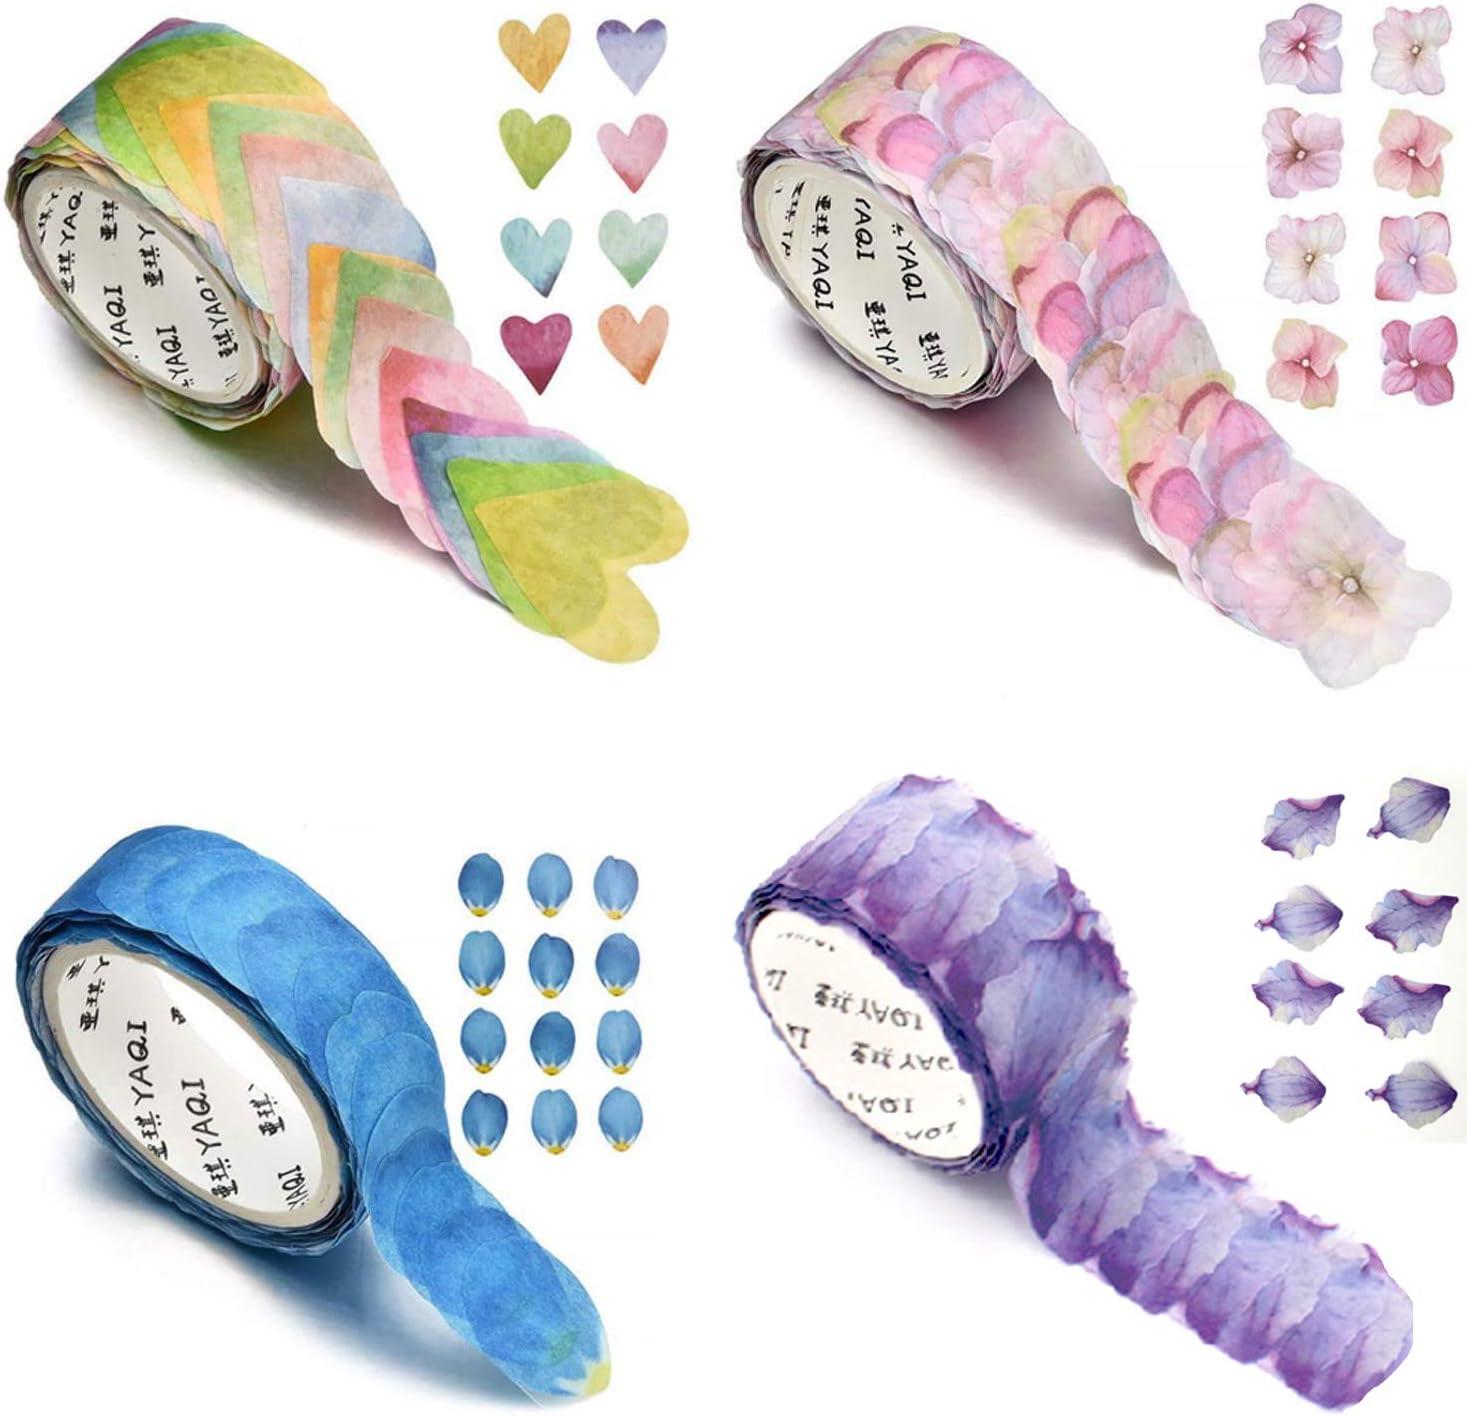 4 Roll Creative Flower Petal Tape Max 87% OFF Masking Free Shipping Cheap Bargain Gift Decorative Washi